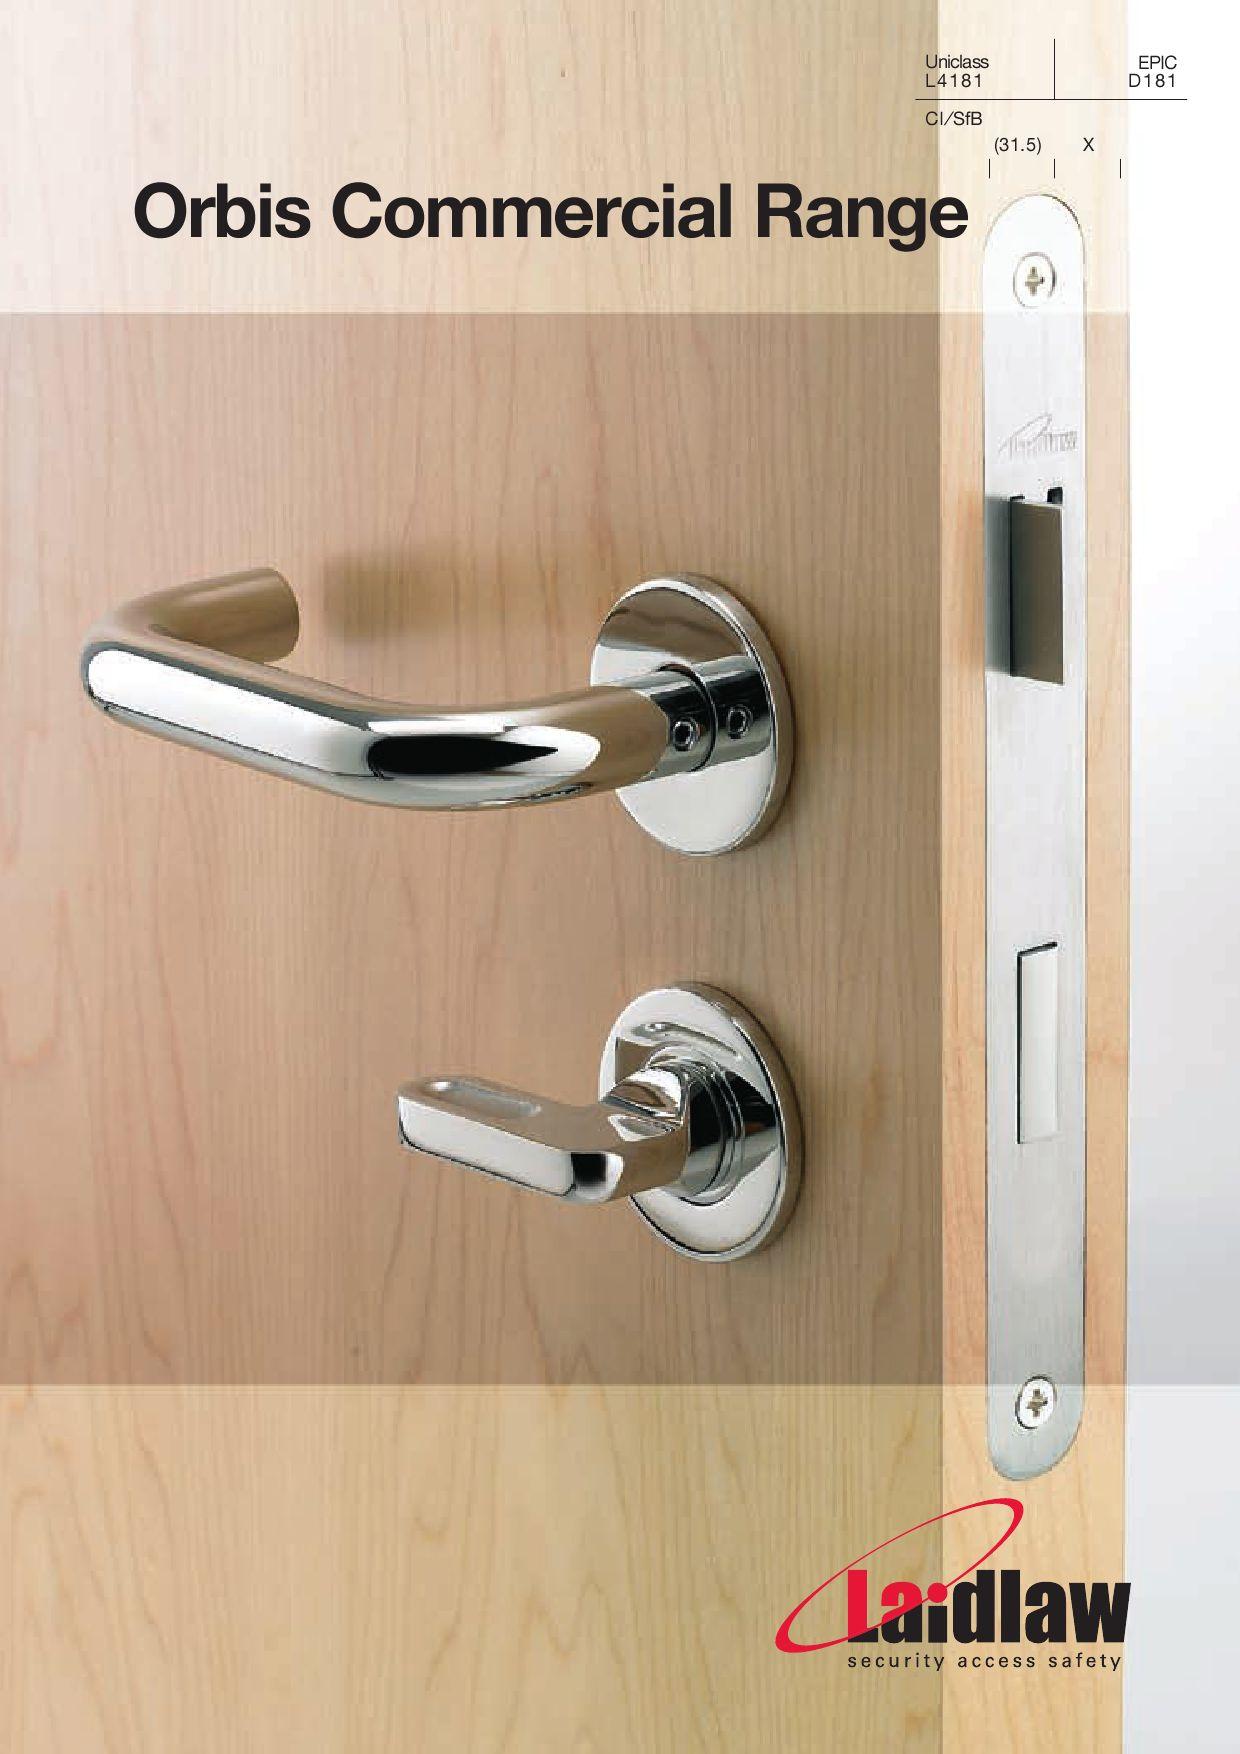 6591 Freeshipping!6xDoor handles!lever handles!locks Privacy set Satin finish